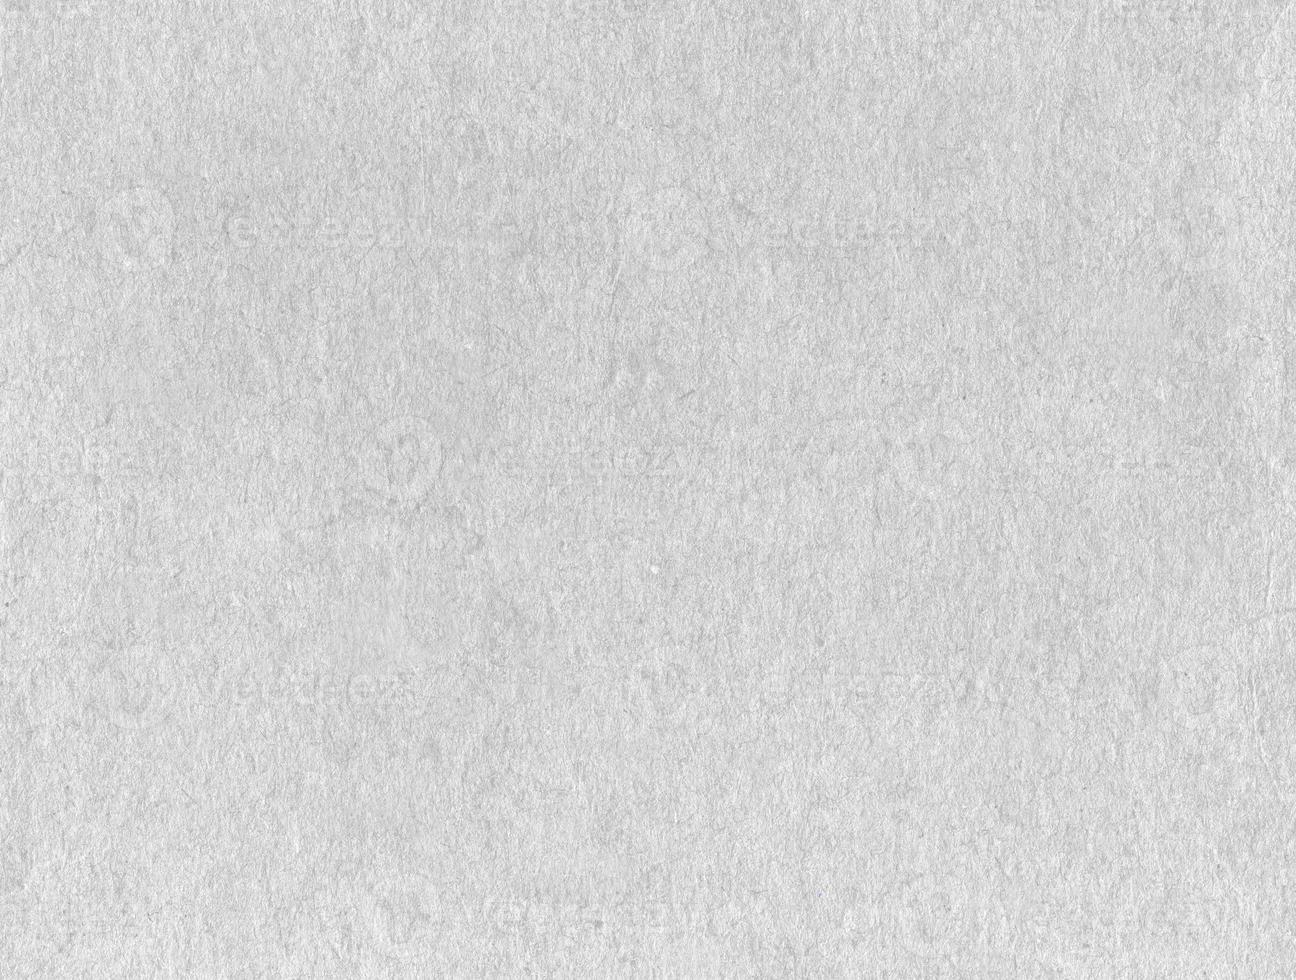 White Paper Texture. photo